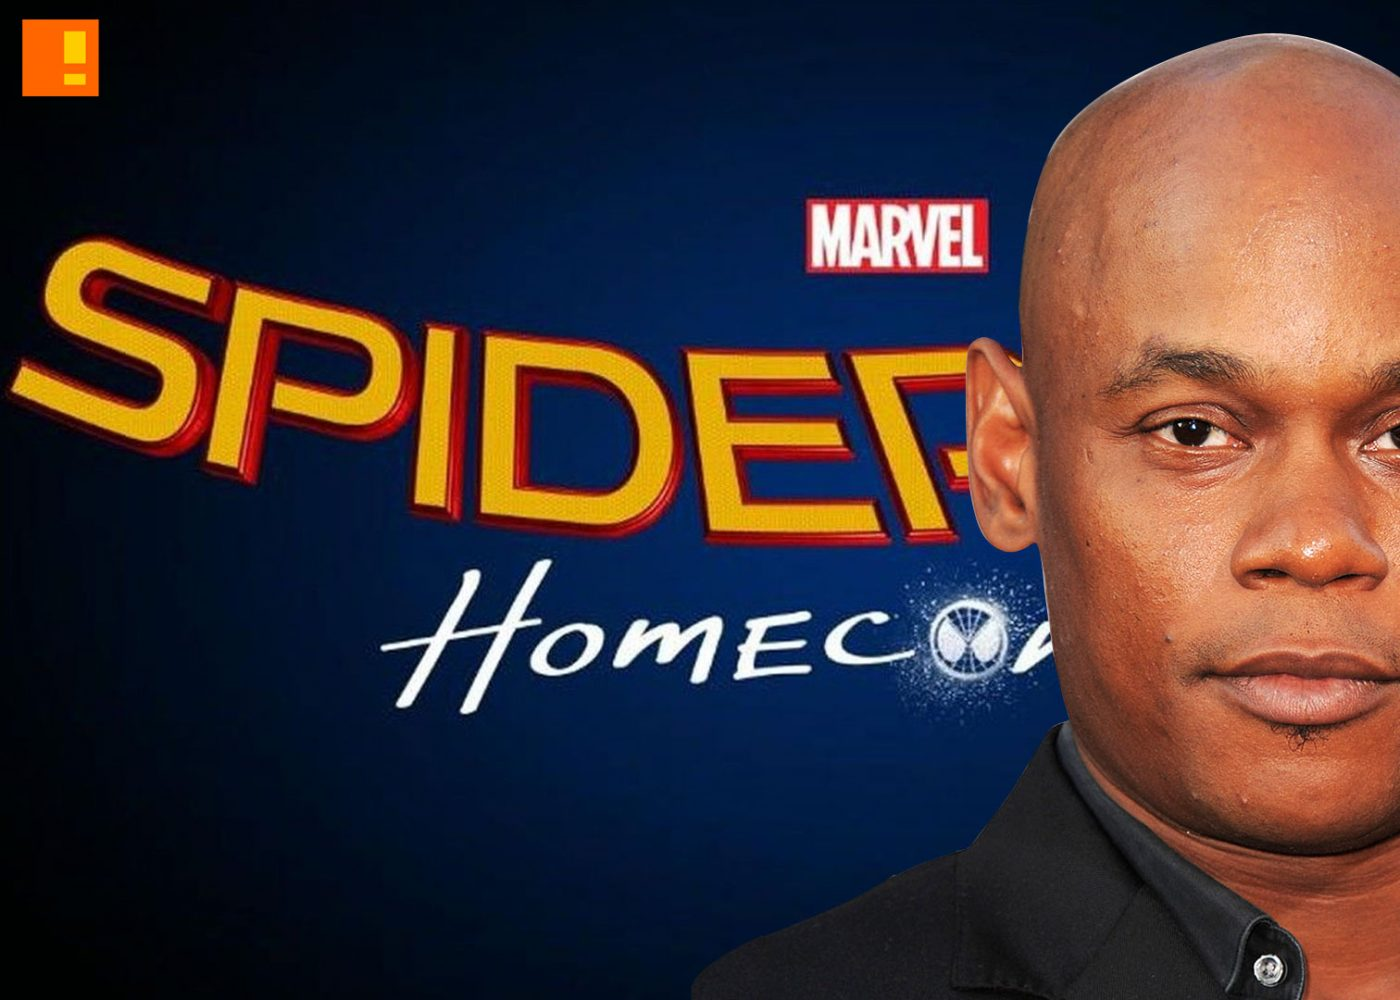 bokeem woodbine, spiderman, spider-man, homecoming, fargo, casting